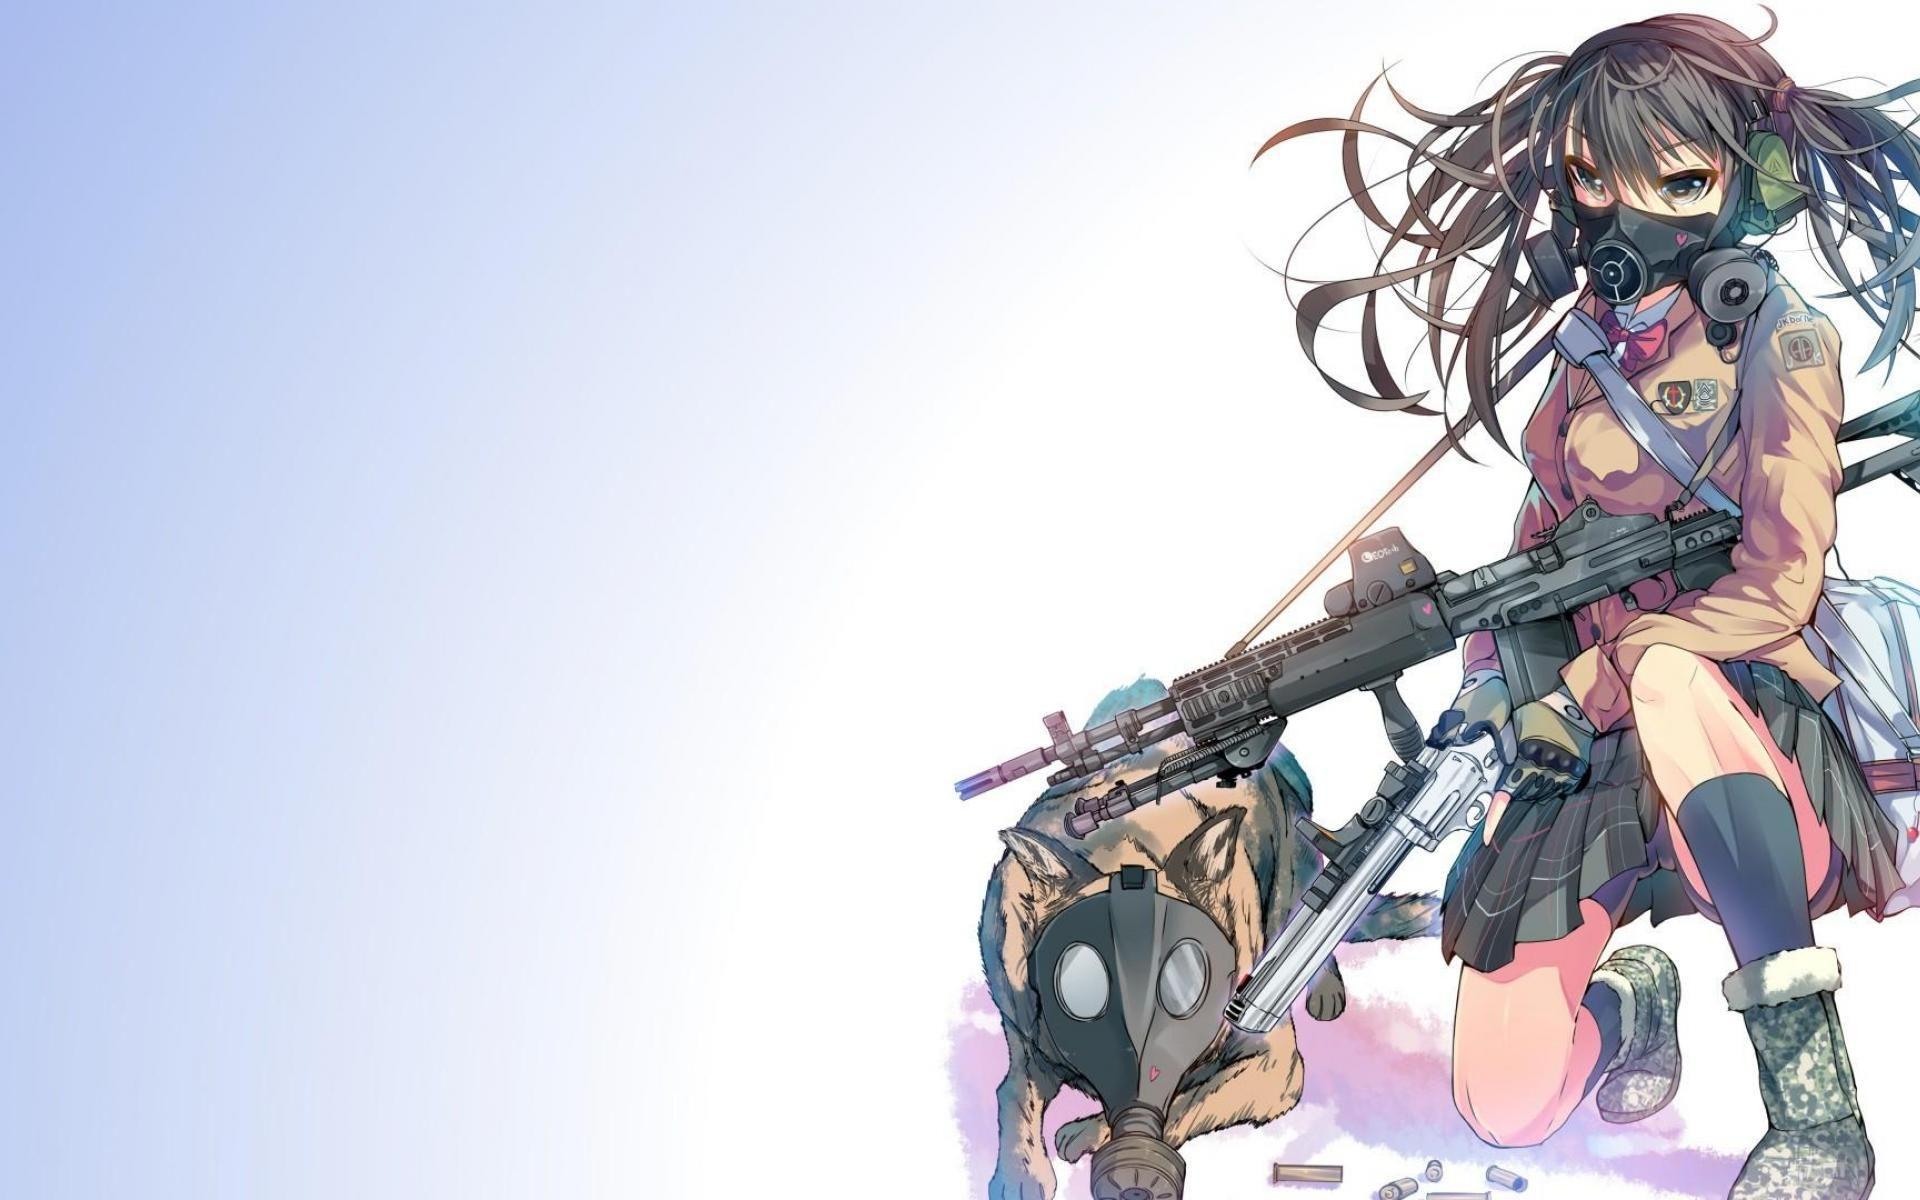 Pin by Oscar Ramos on Anime girl gun Pinterest Wallpapers